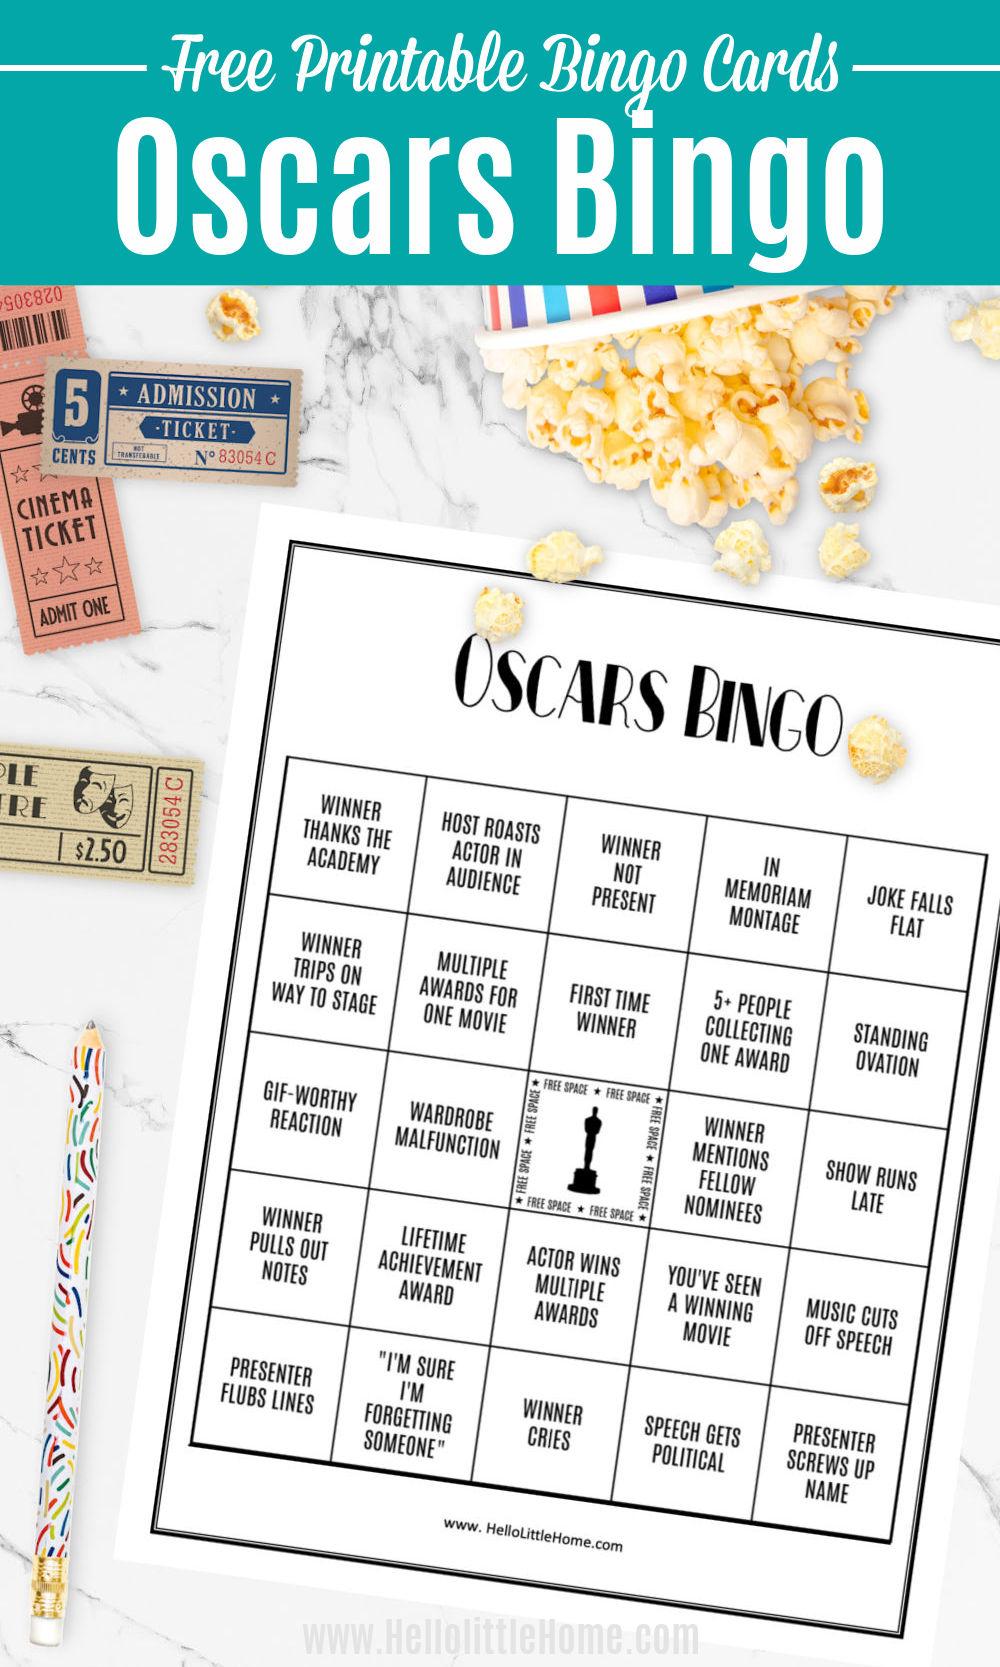 An Oscars Bingo Card, popcorn, movie tickets, and a pencil on a marble table.